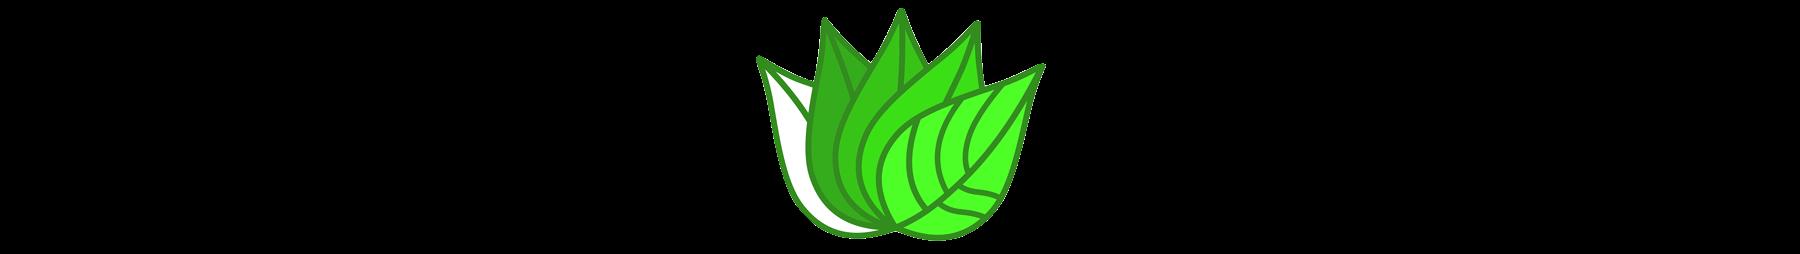 0_4 Leaf long.png